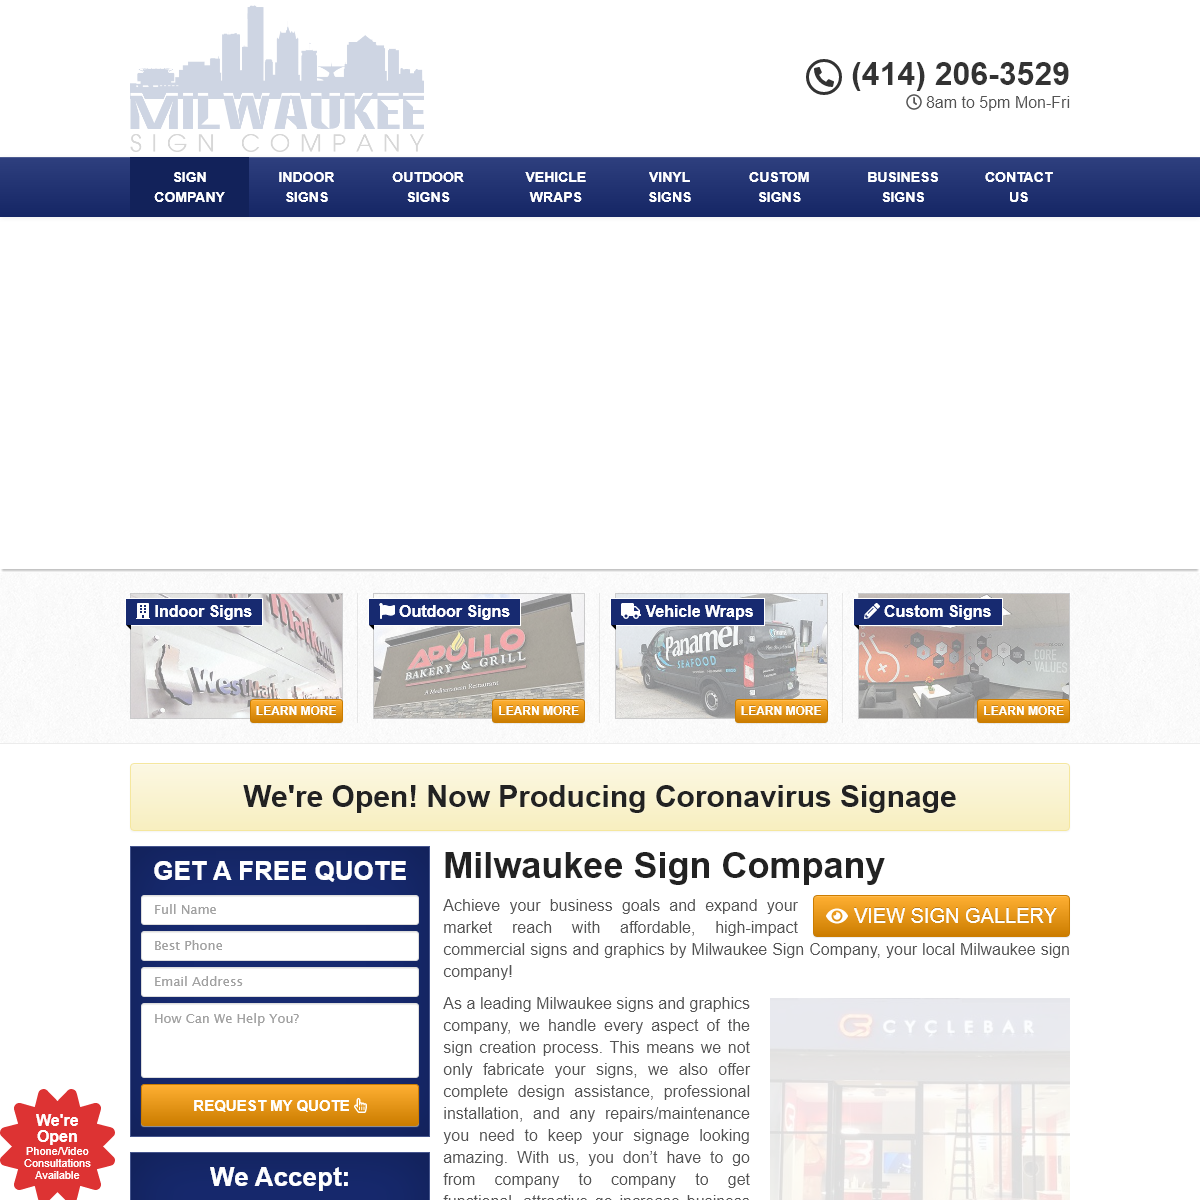 Best Milwaukee Sign Company - Custom Signs, Graphics, & Wraps Near Me